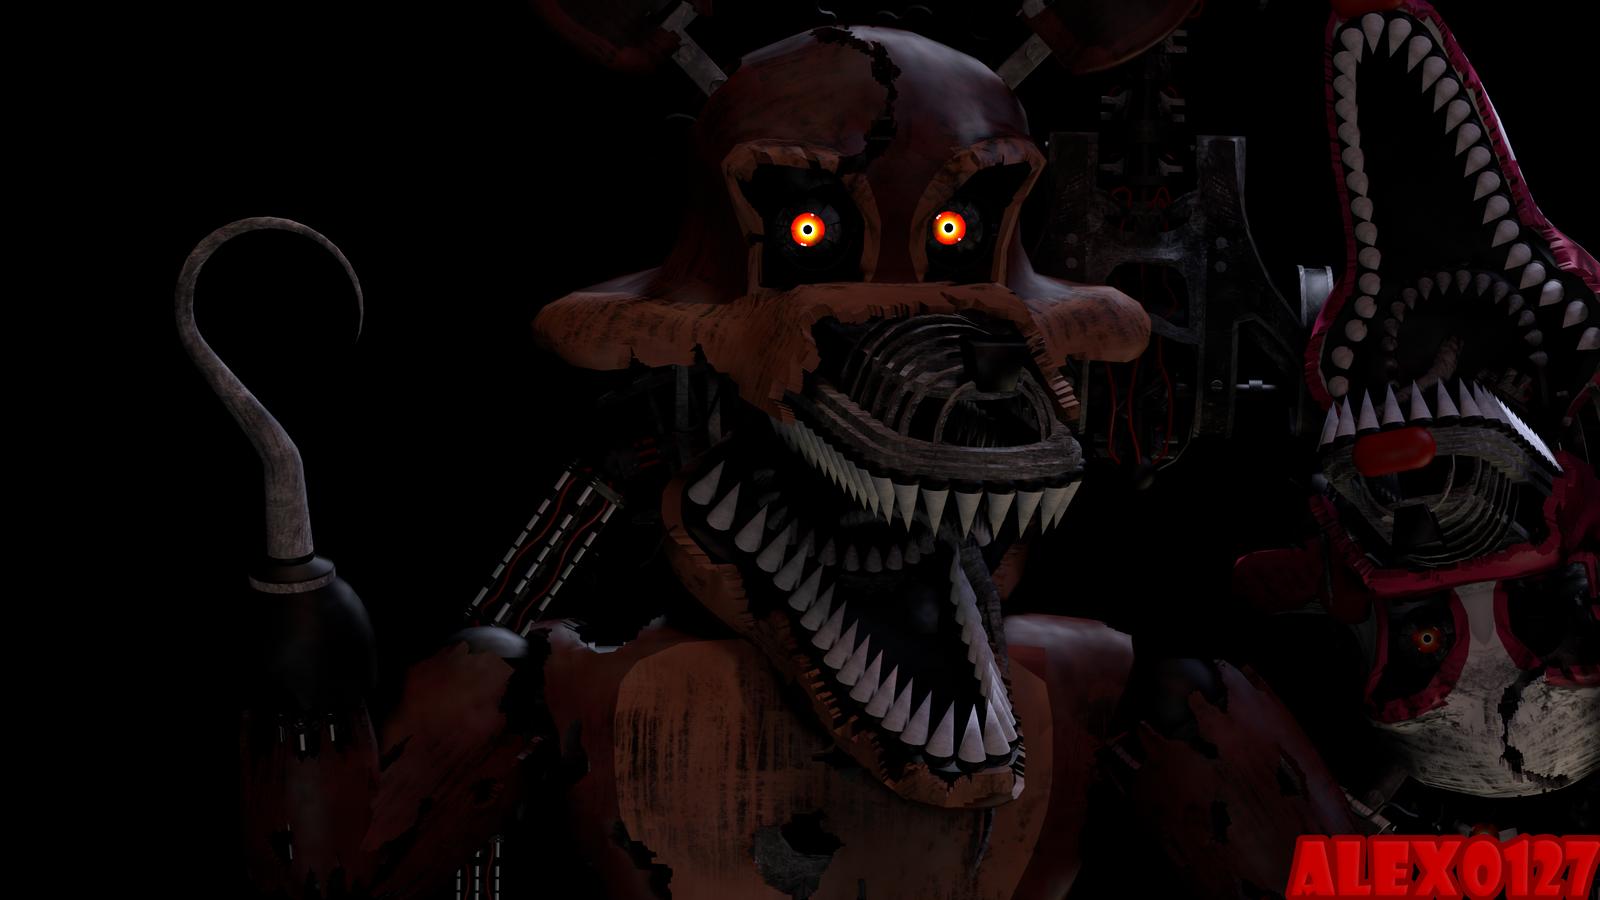 fnaf 4 mangle nightmare - photo #37